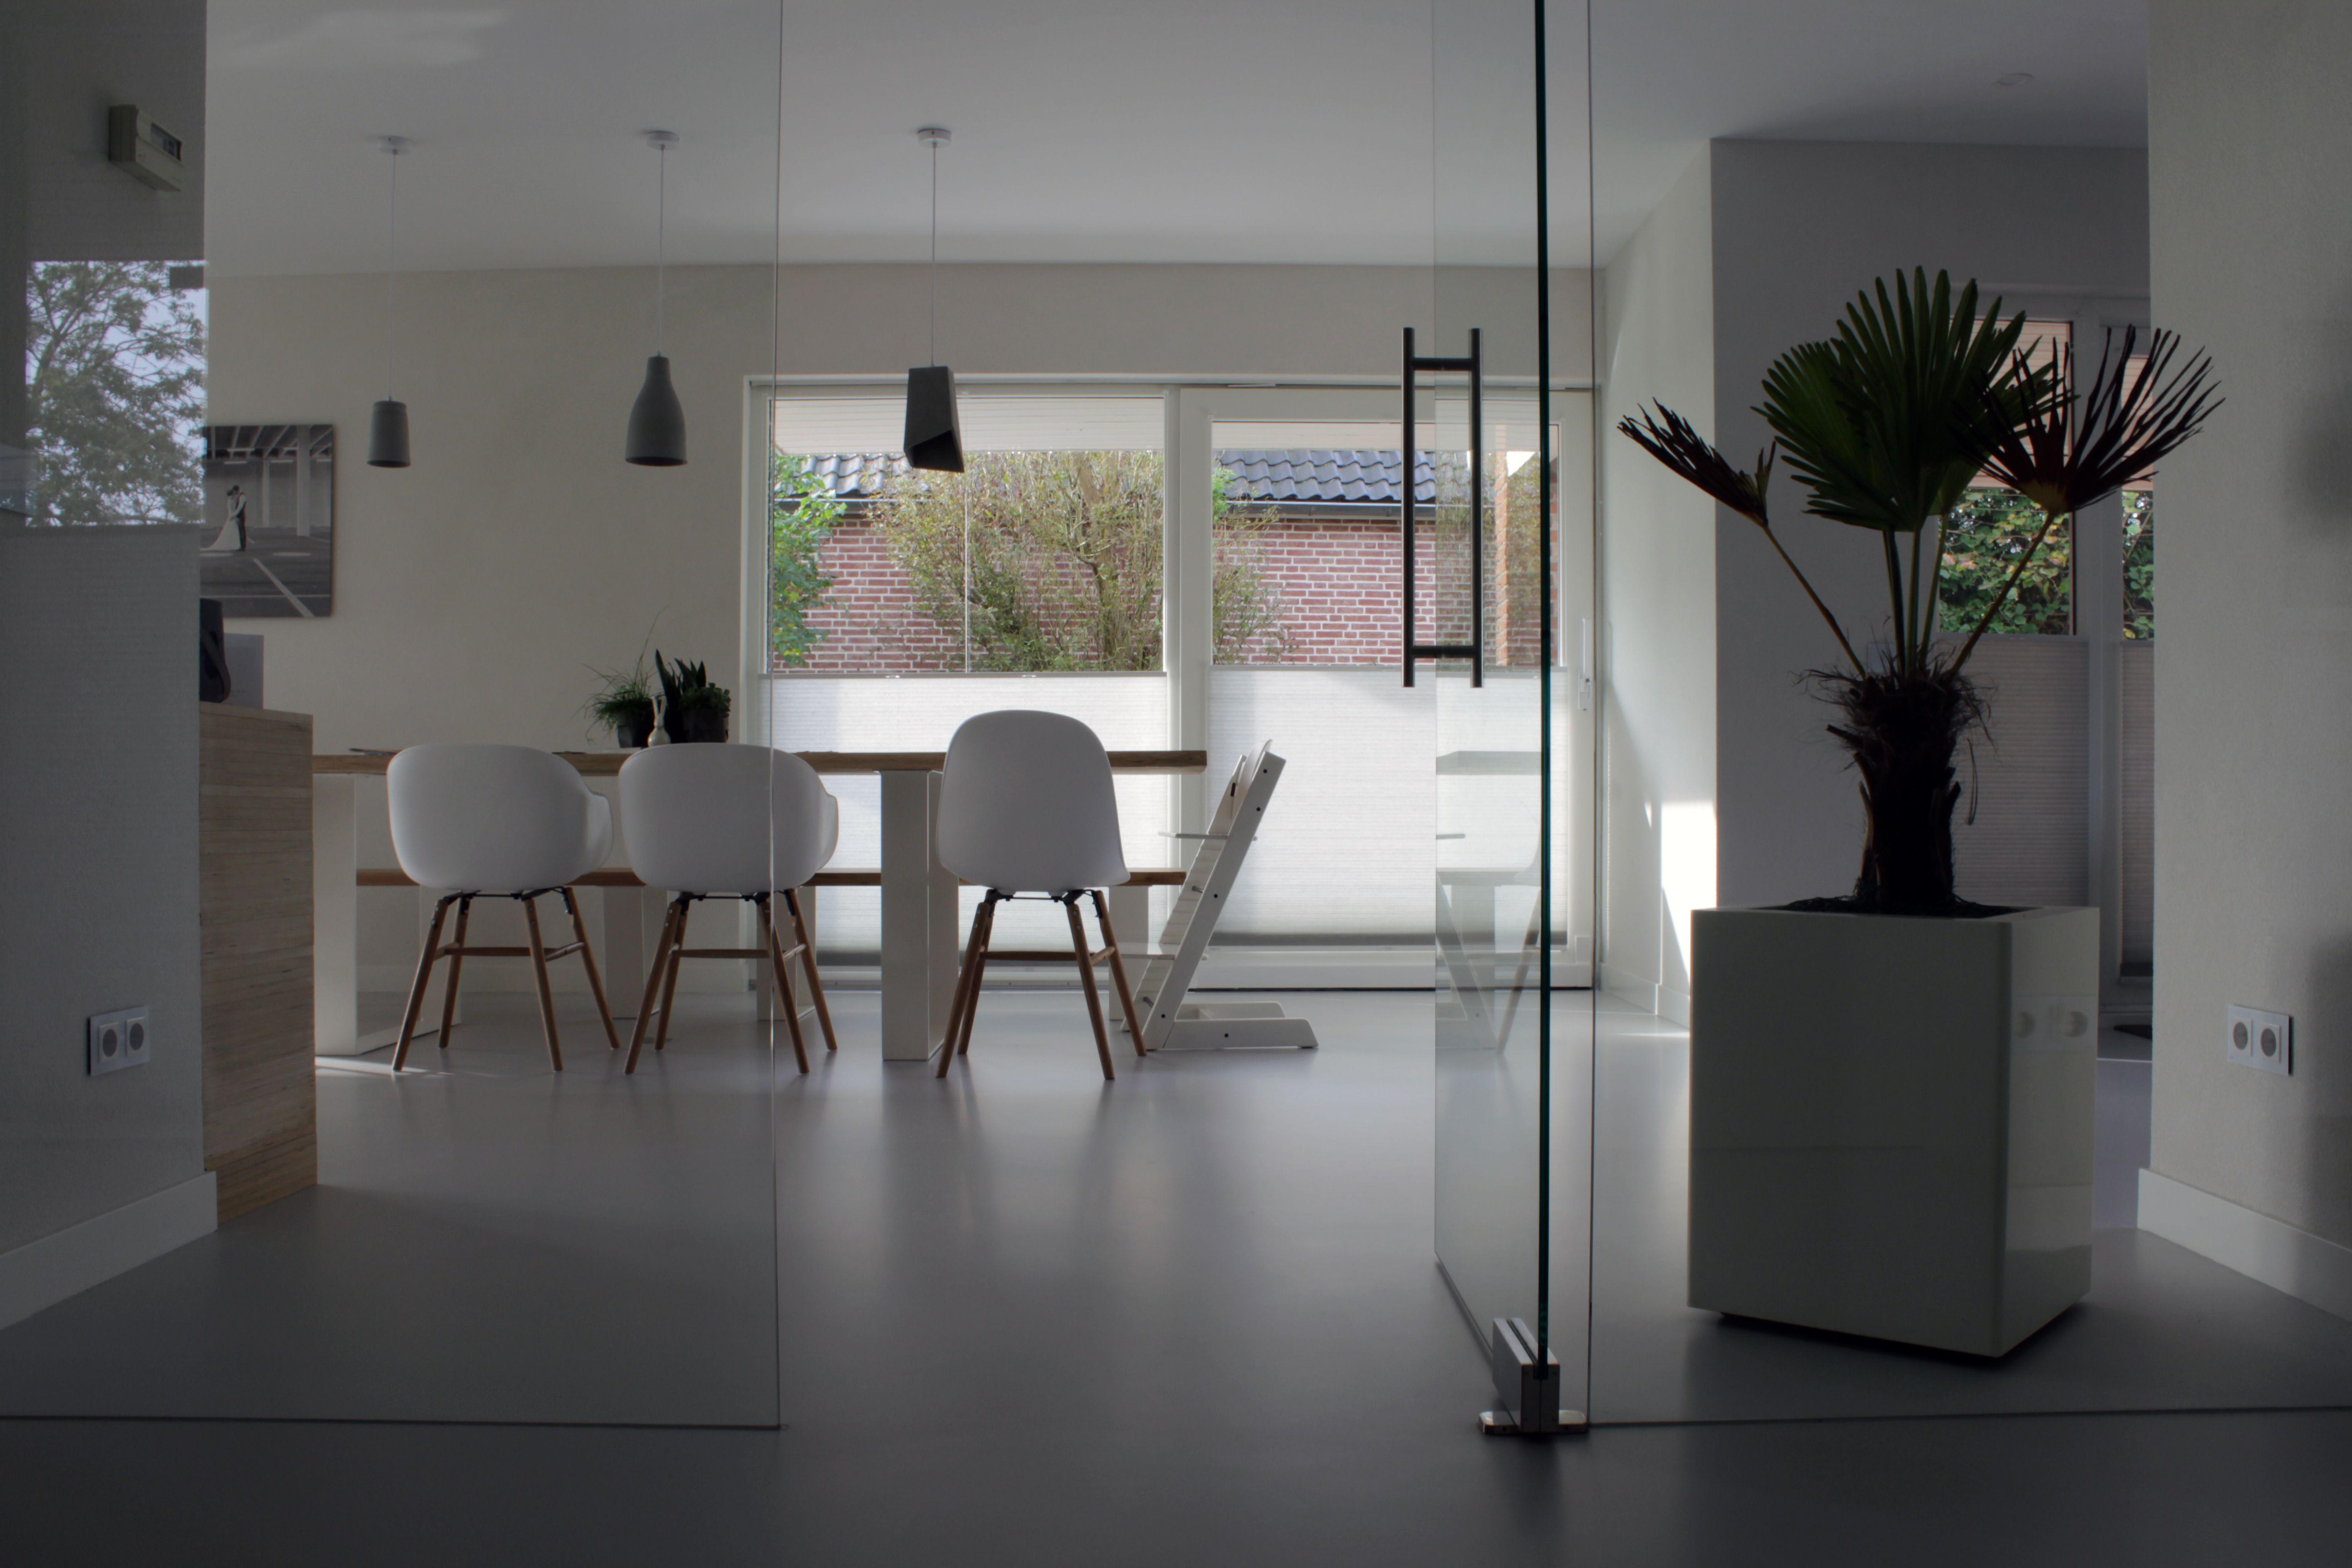 Gietvloer Betonlook Keuken : Betonlook gietvloer in keuken motion gietvloeren gietvloer